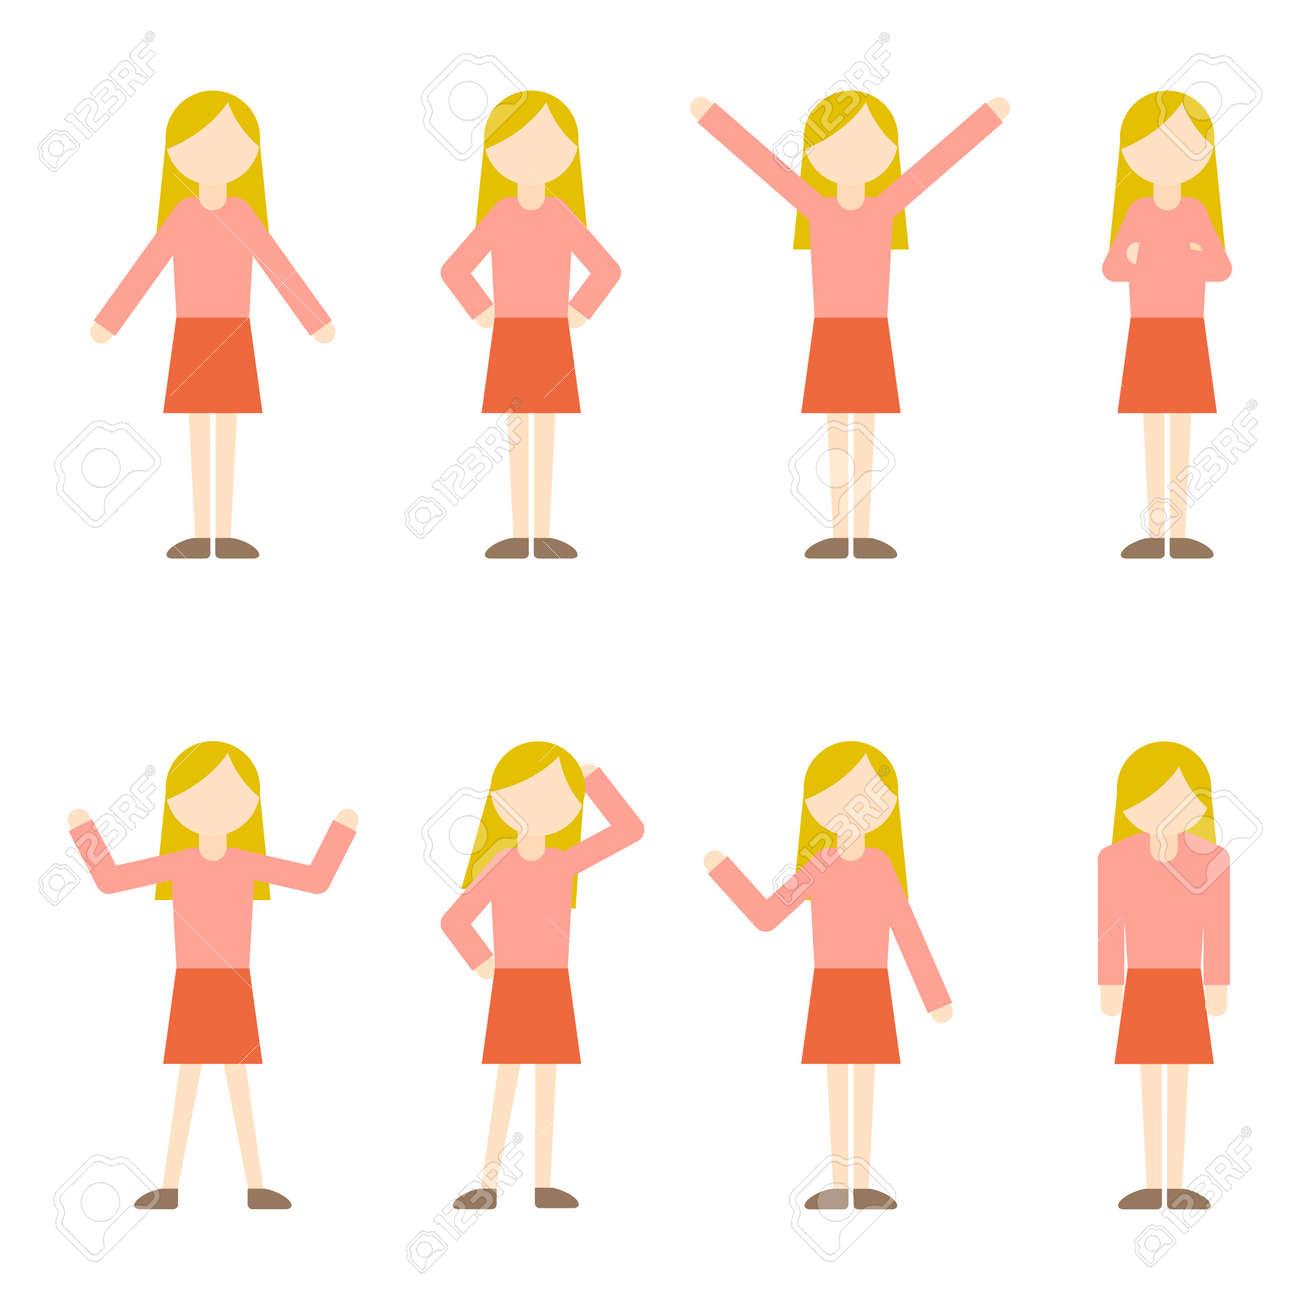 Flat Icon Person Mom Woman - 168585554